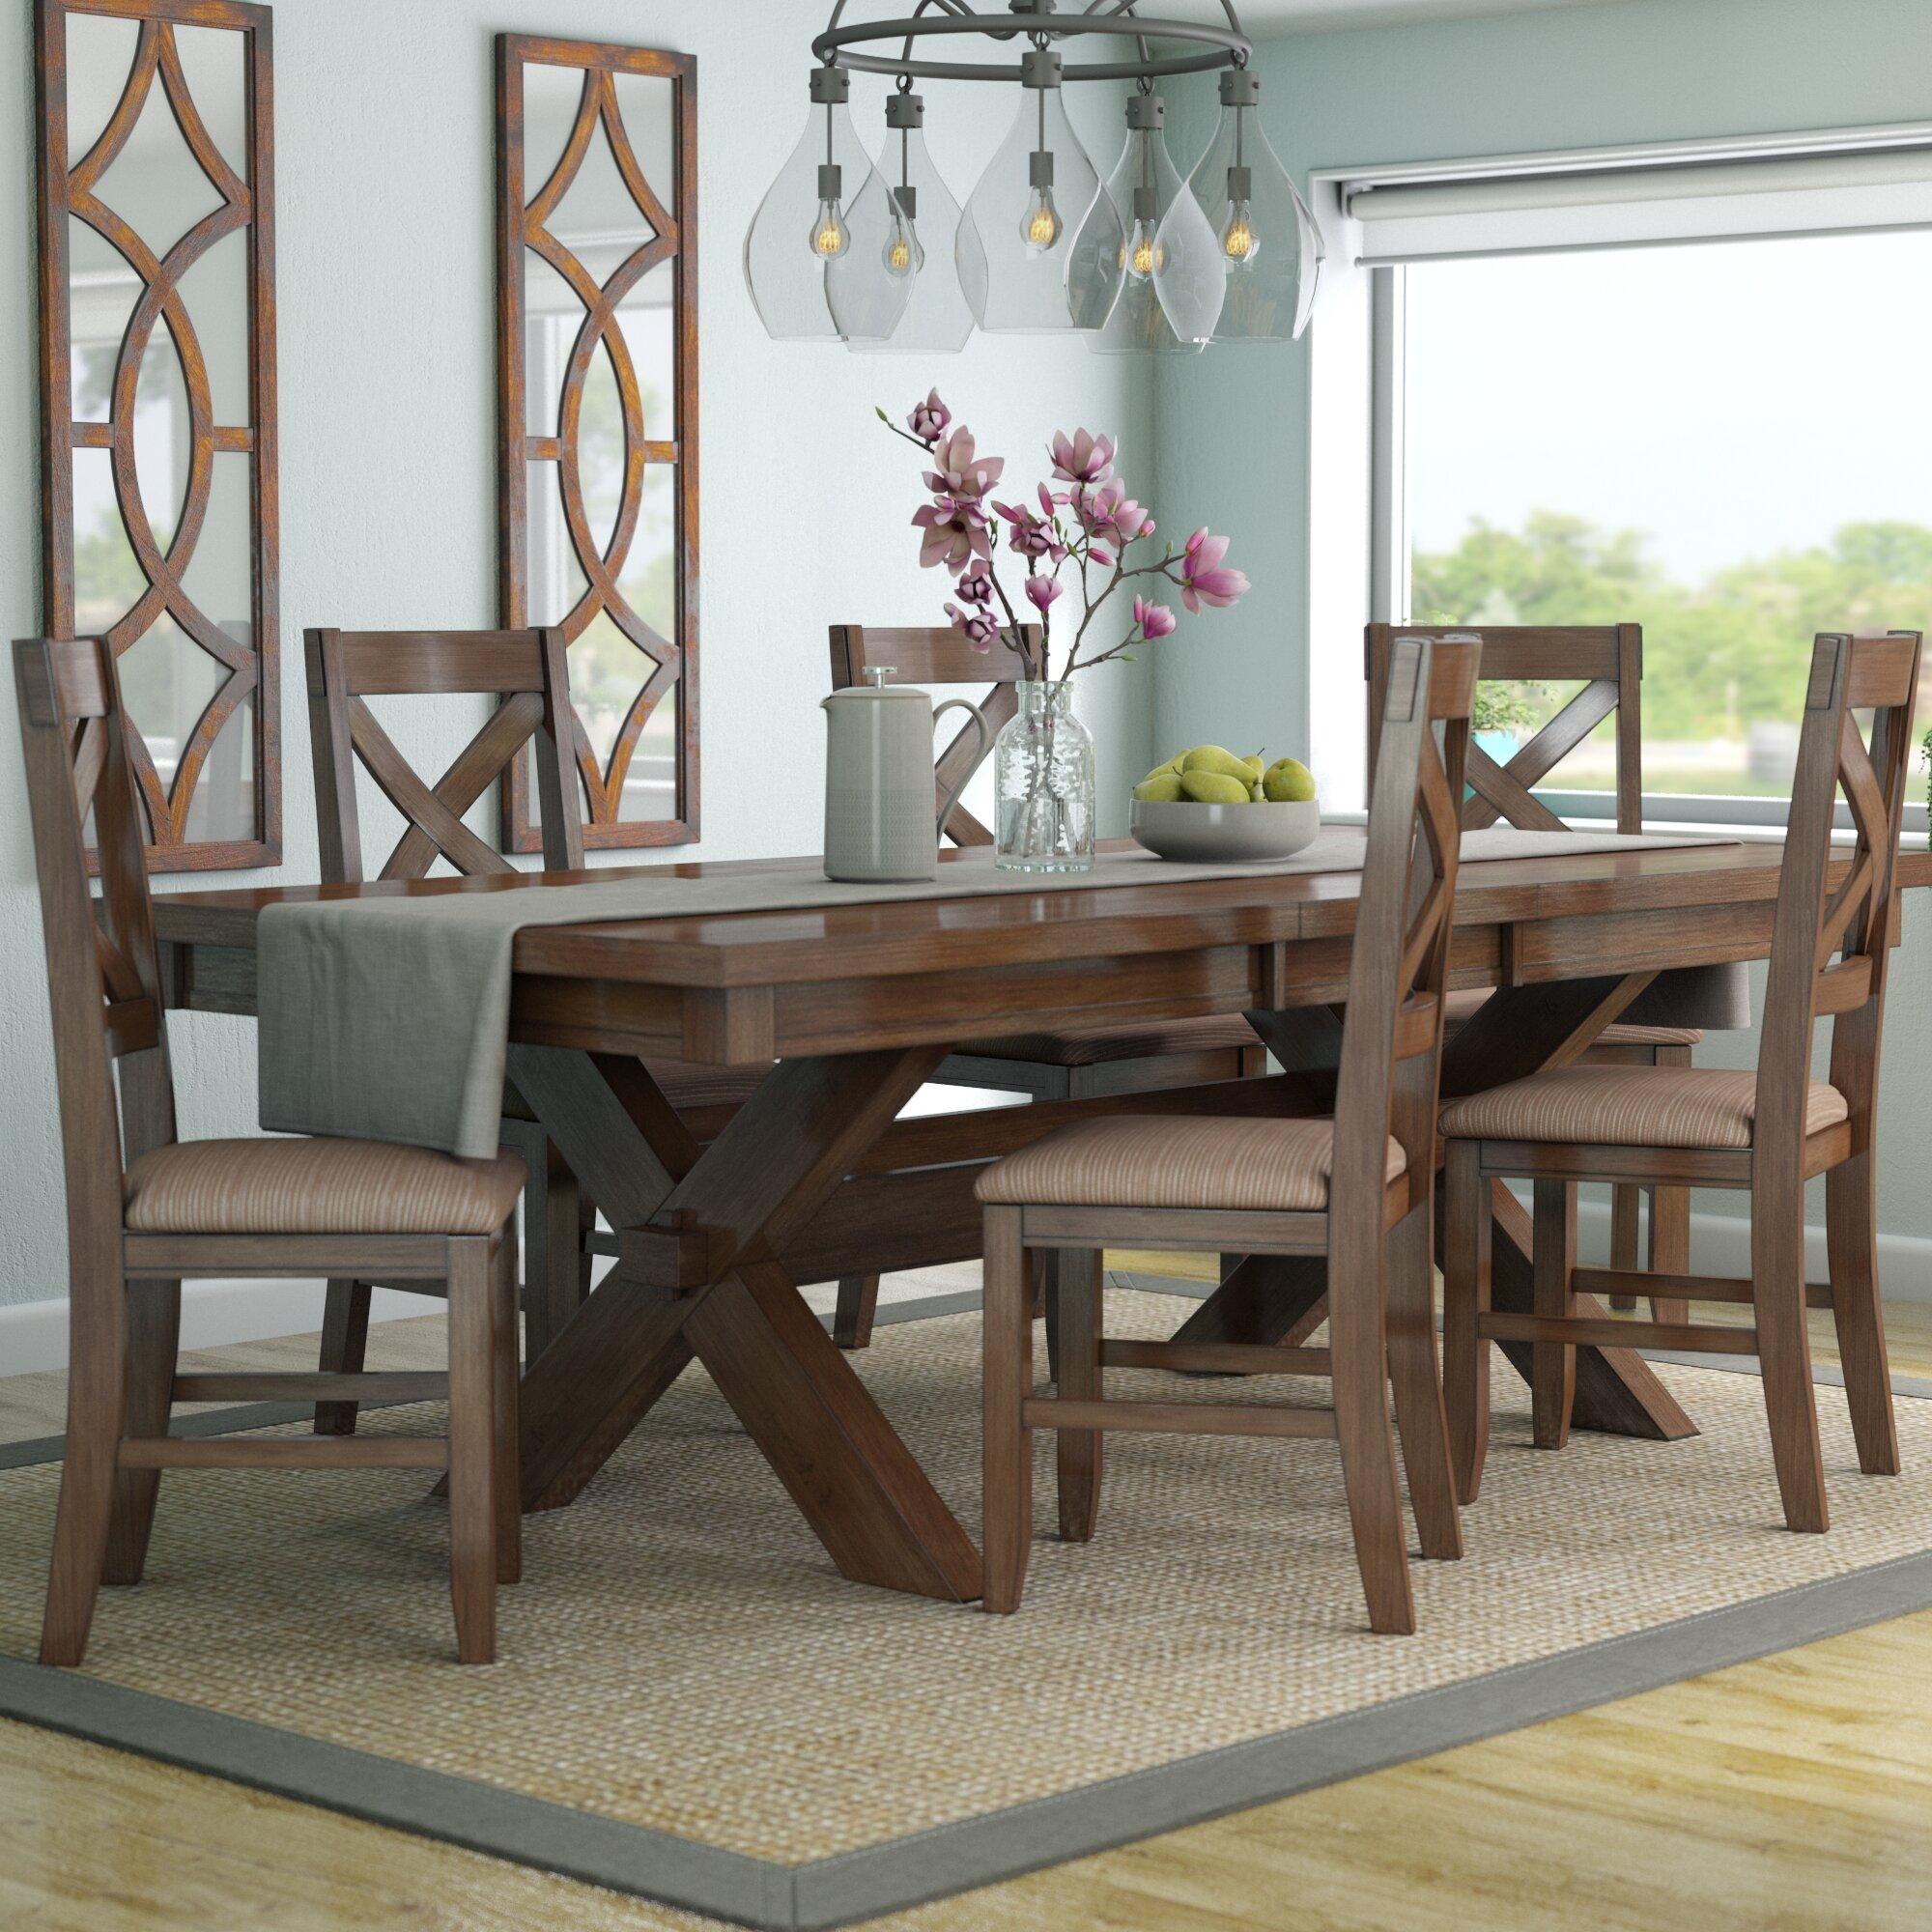 Laurel Foundry Modern Farmhouse Isabell 7 Piece Dining Set U0026 Reviews |  Wayfair